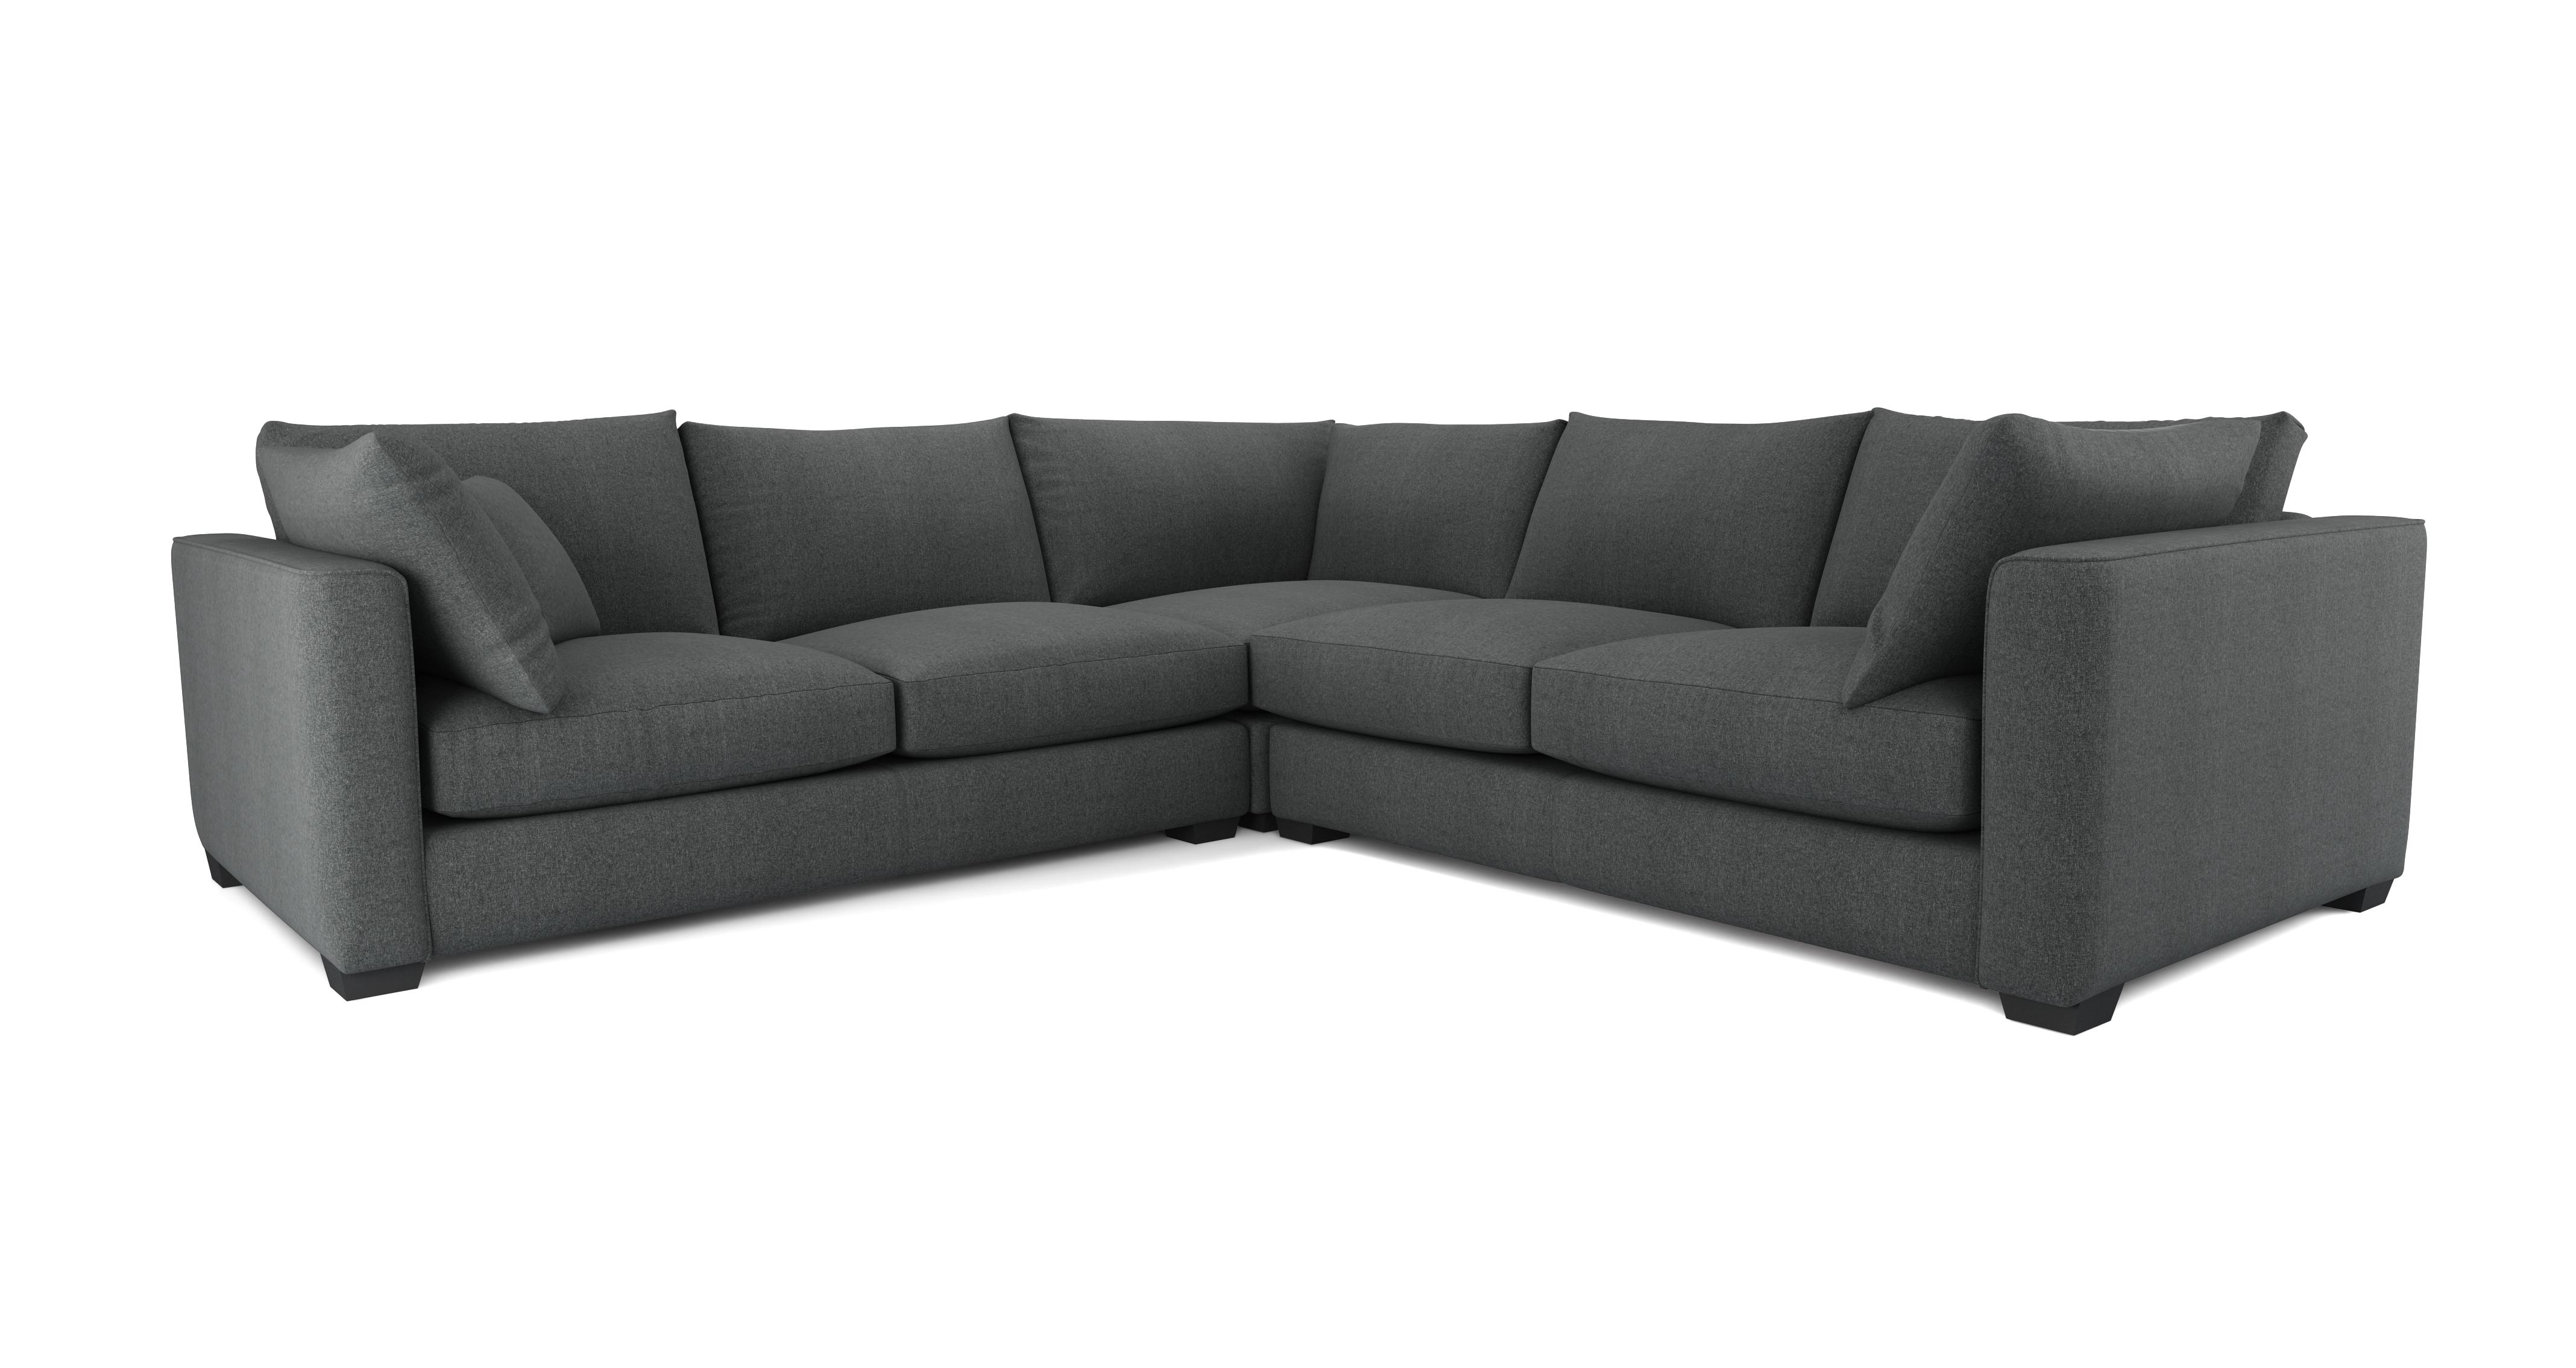 keaton small corner sofa